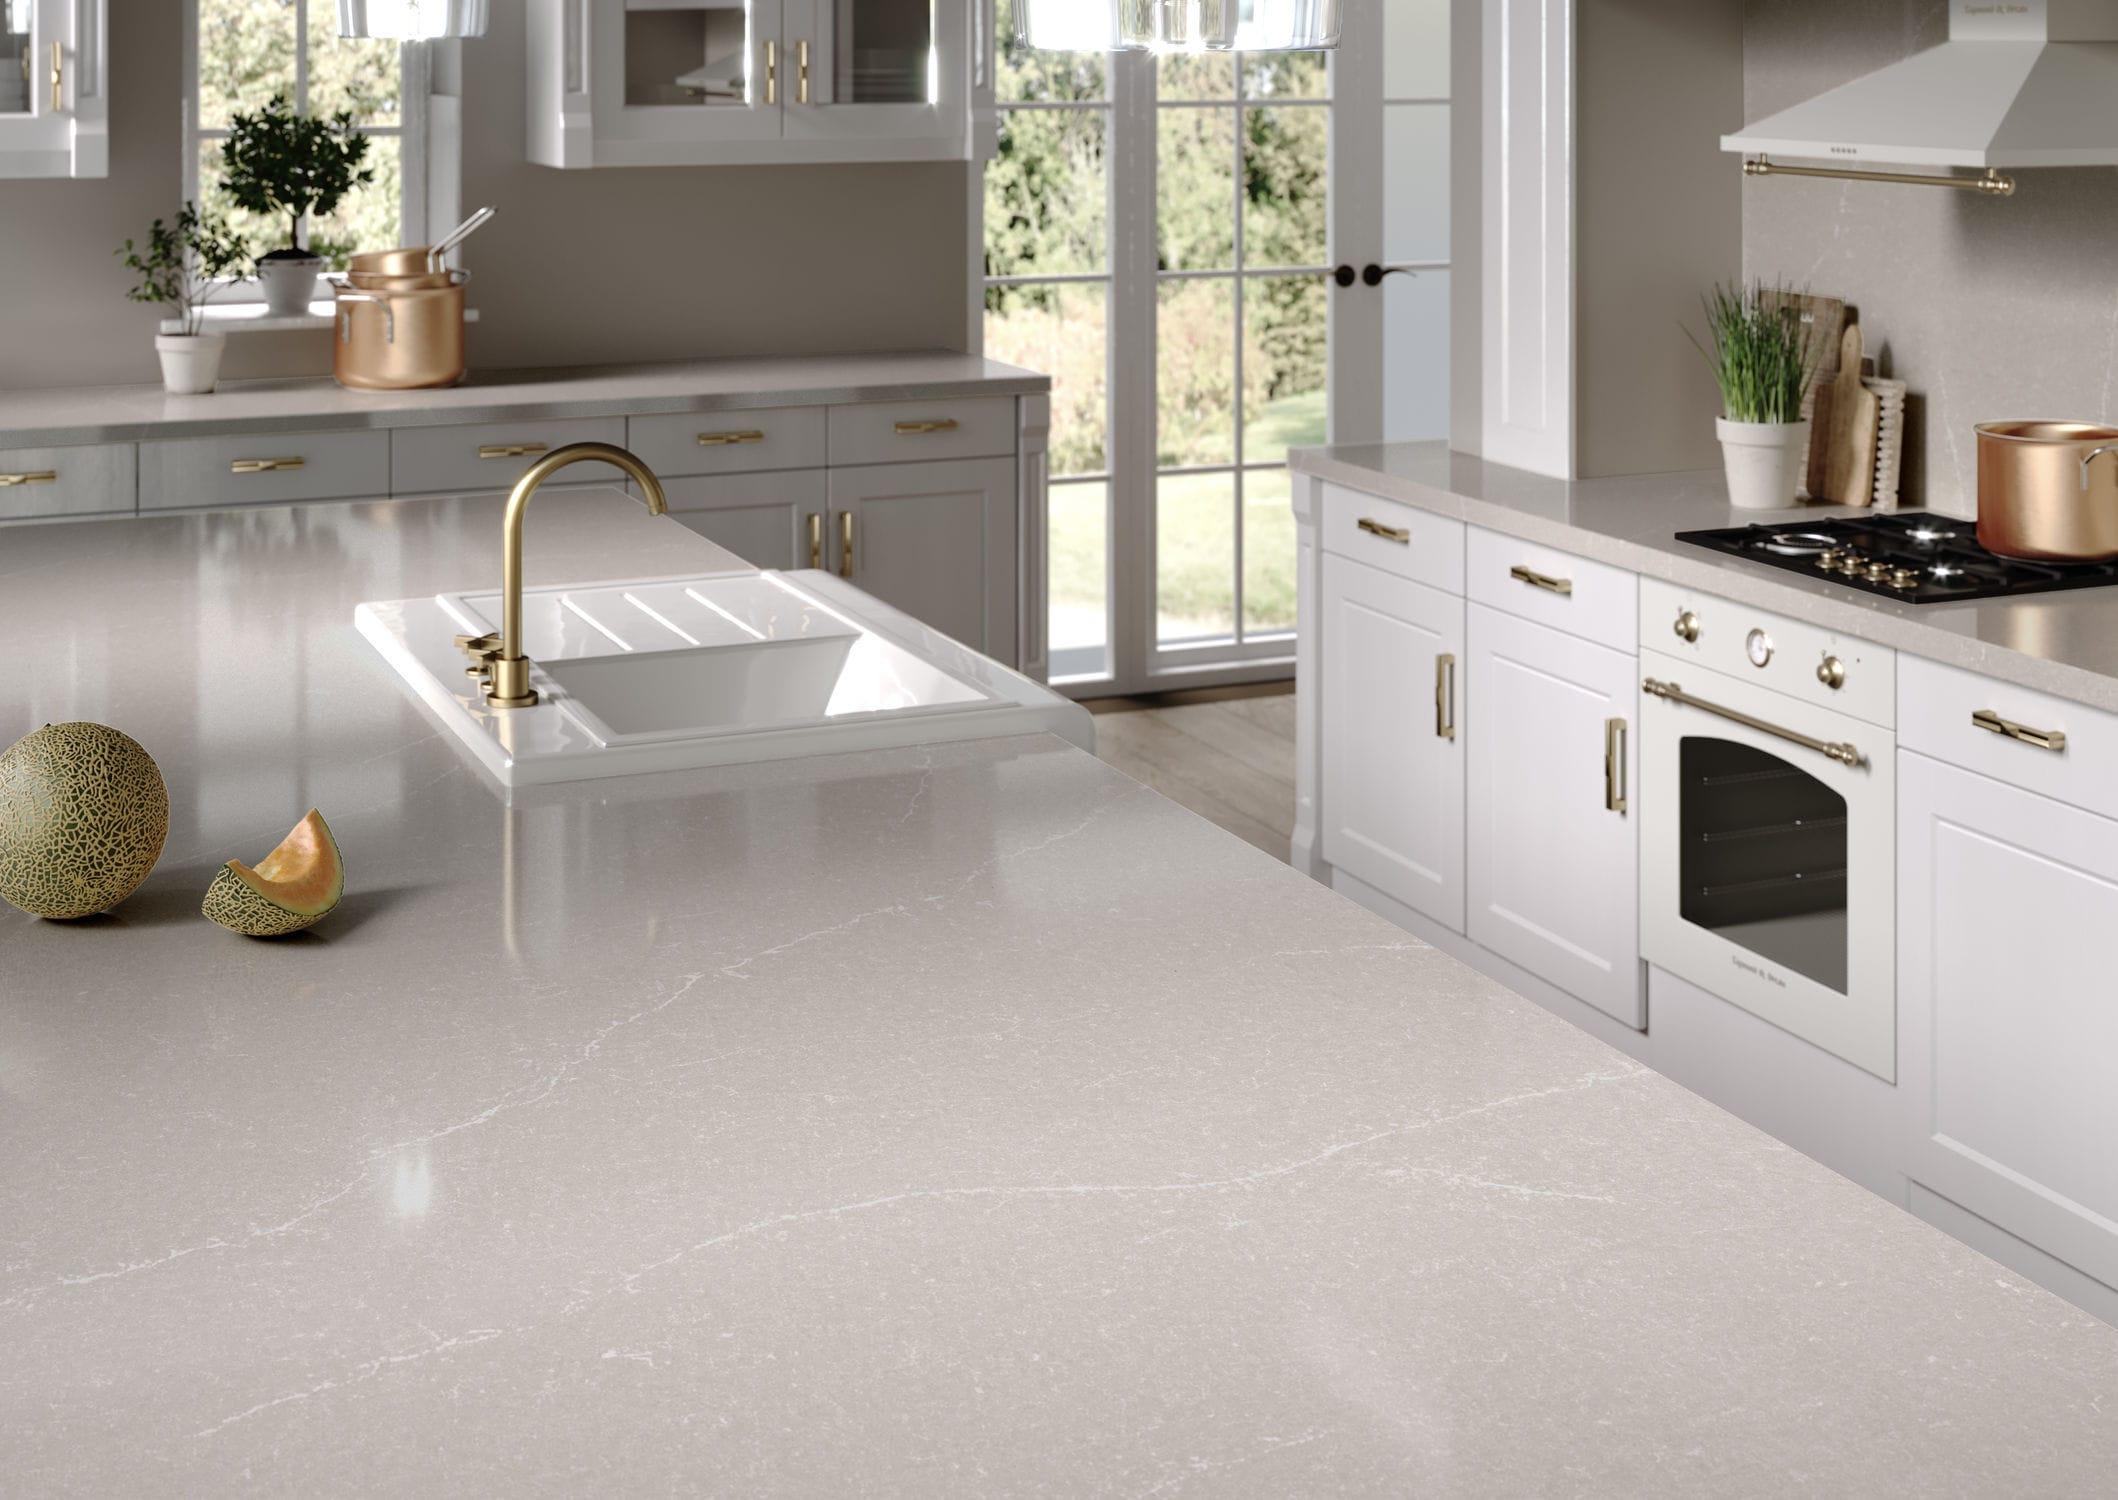 Silestone® Countertop / Marble / Kitchen / White   DESERT SILVER